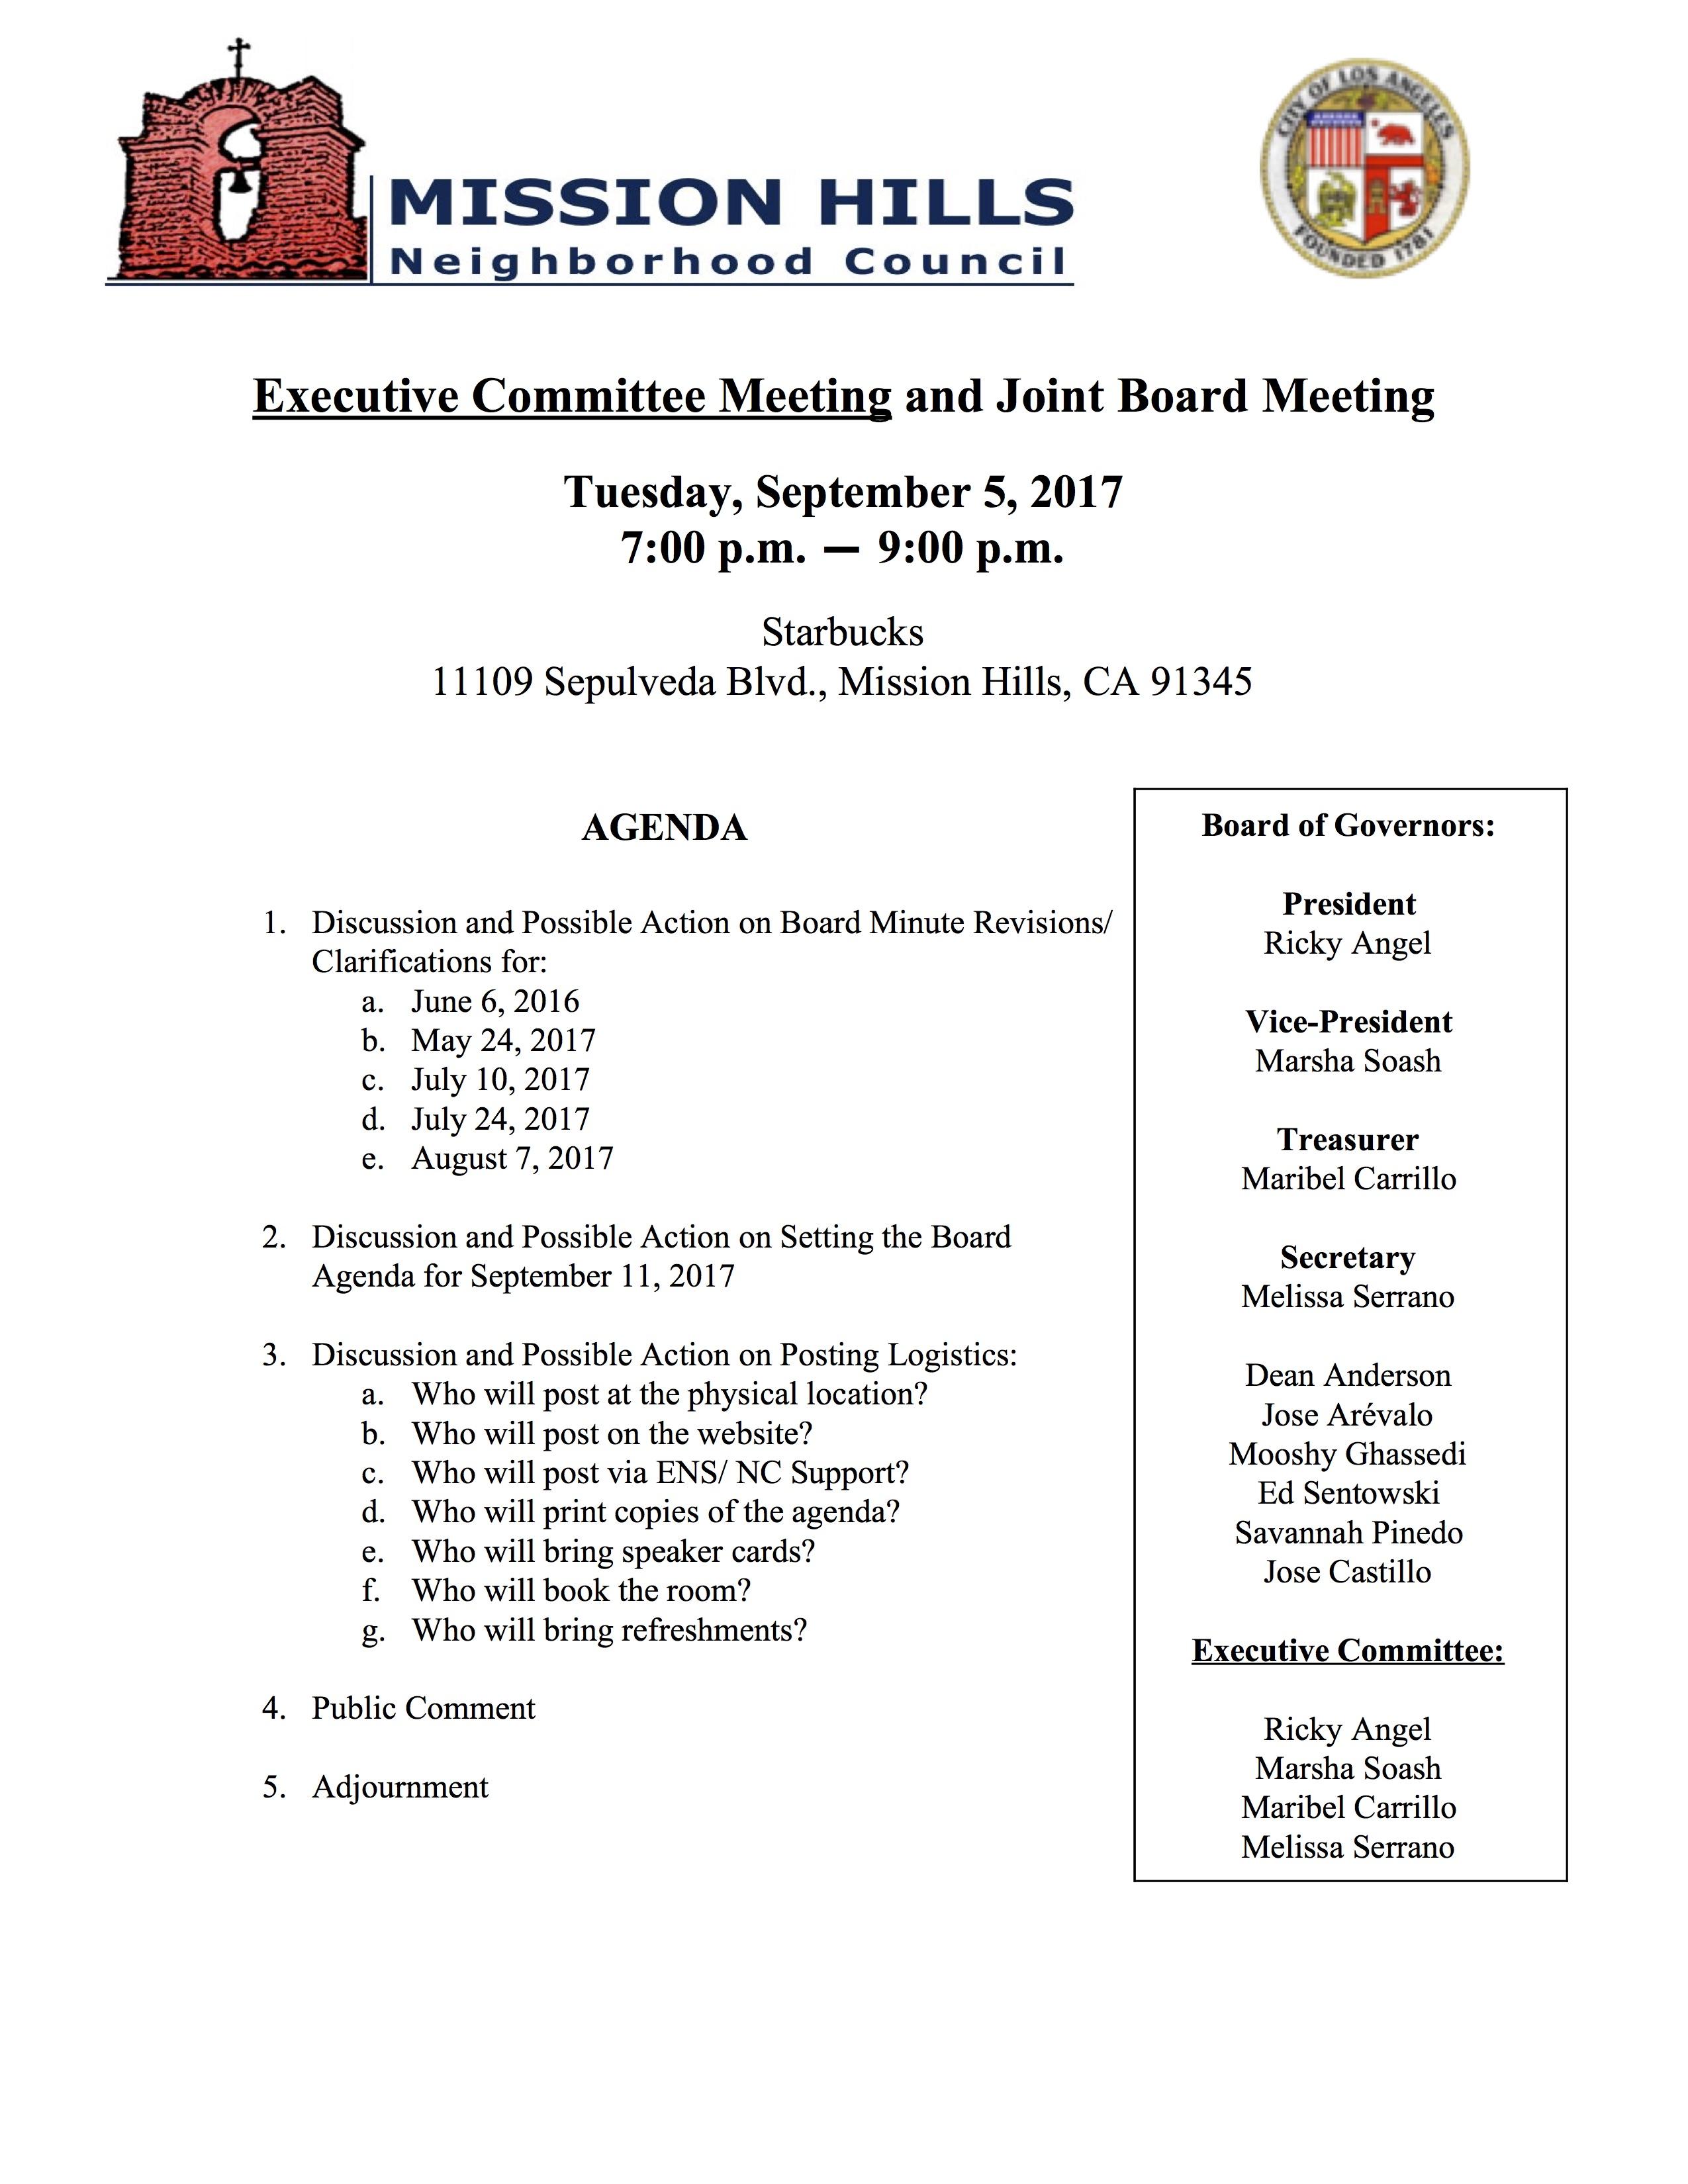 Executive Agenda 9.5.17